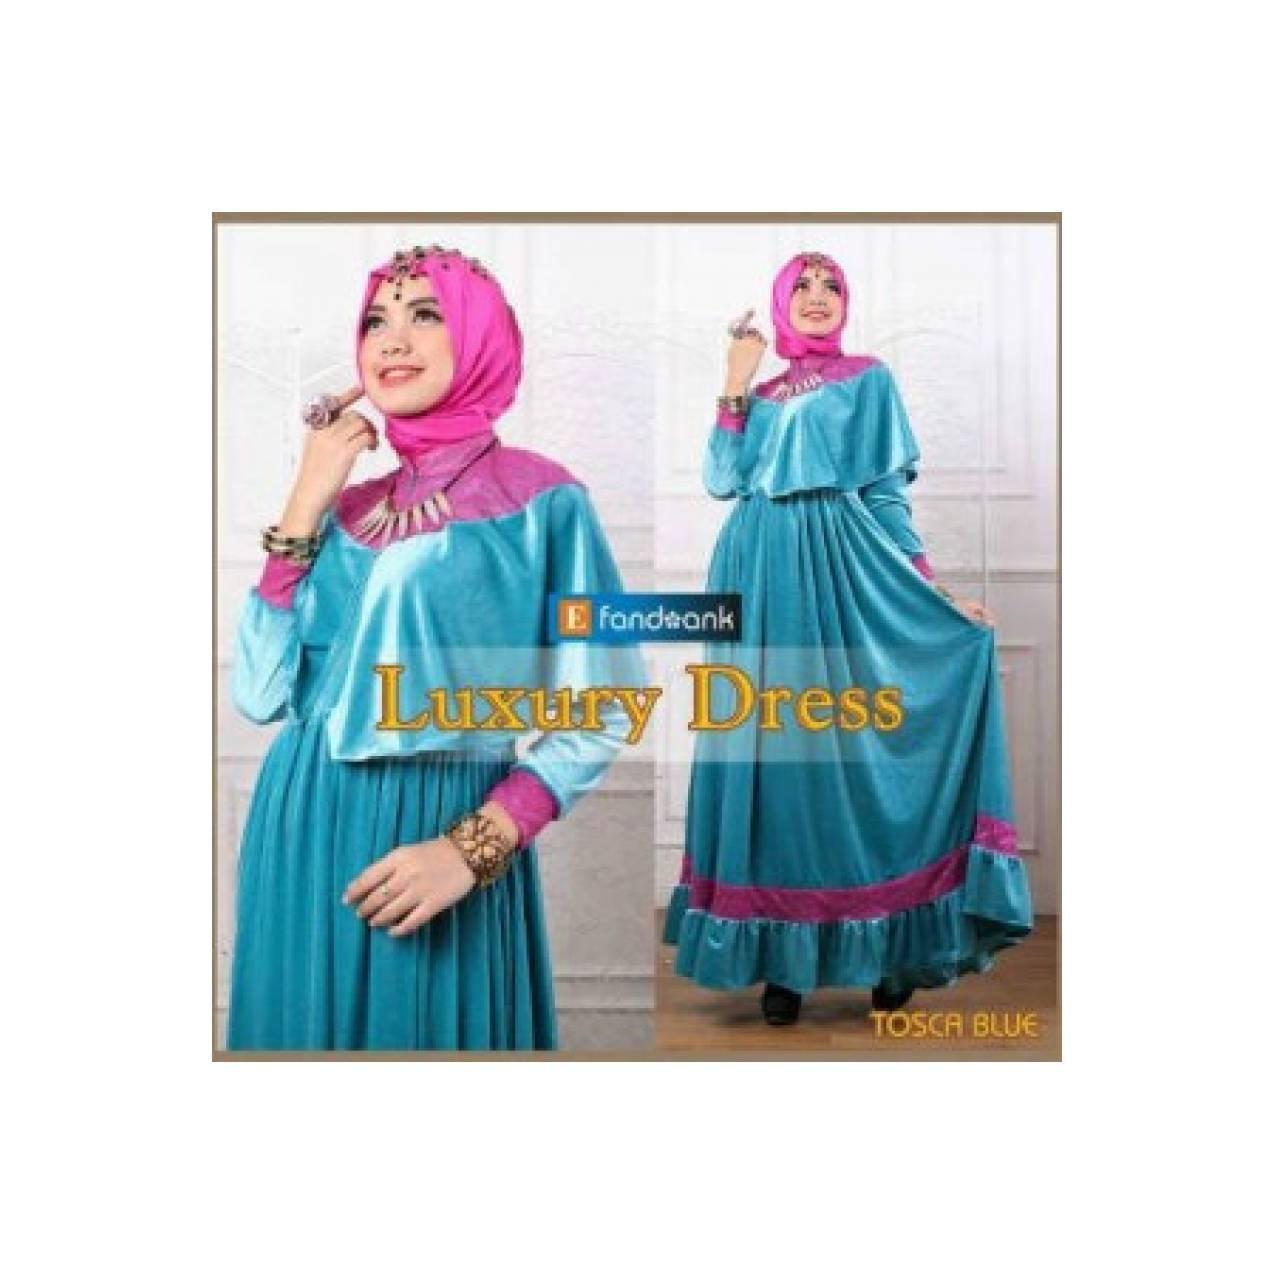 Baju pesta mewah exclusive luxury dress by efandoank origina T2909